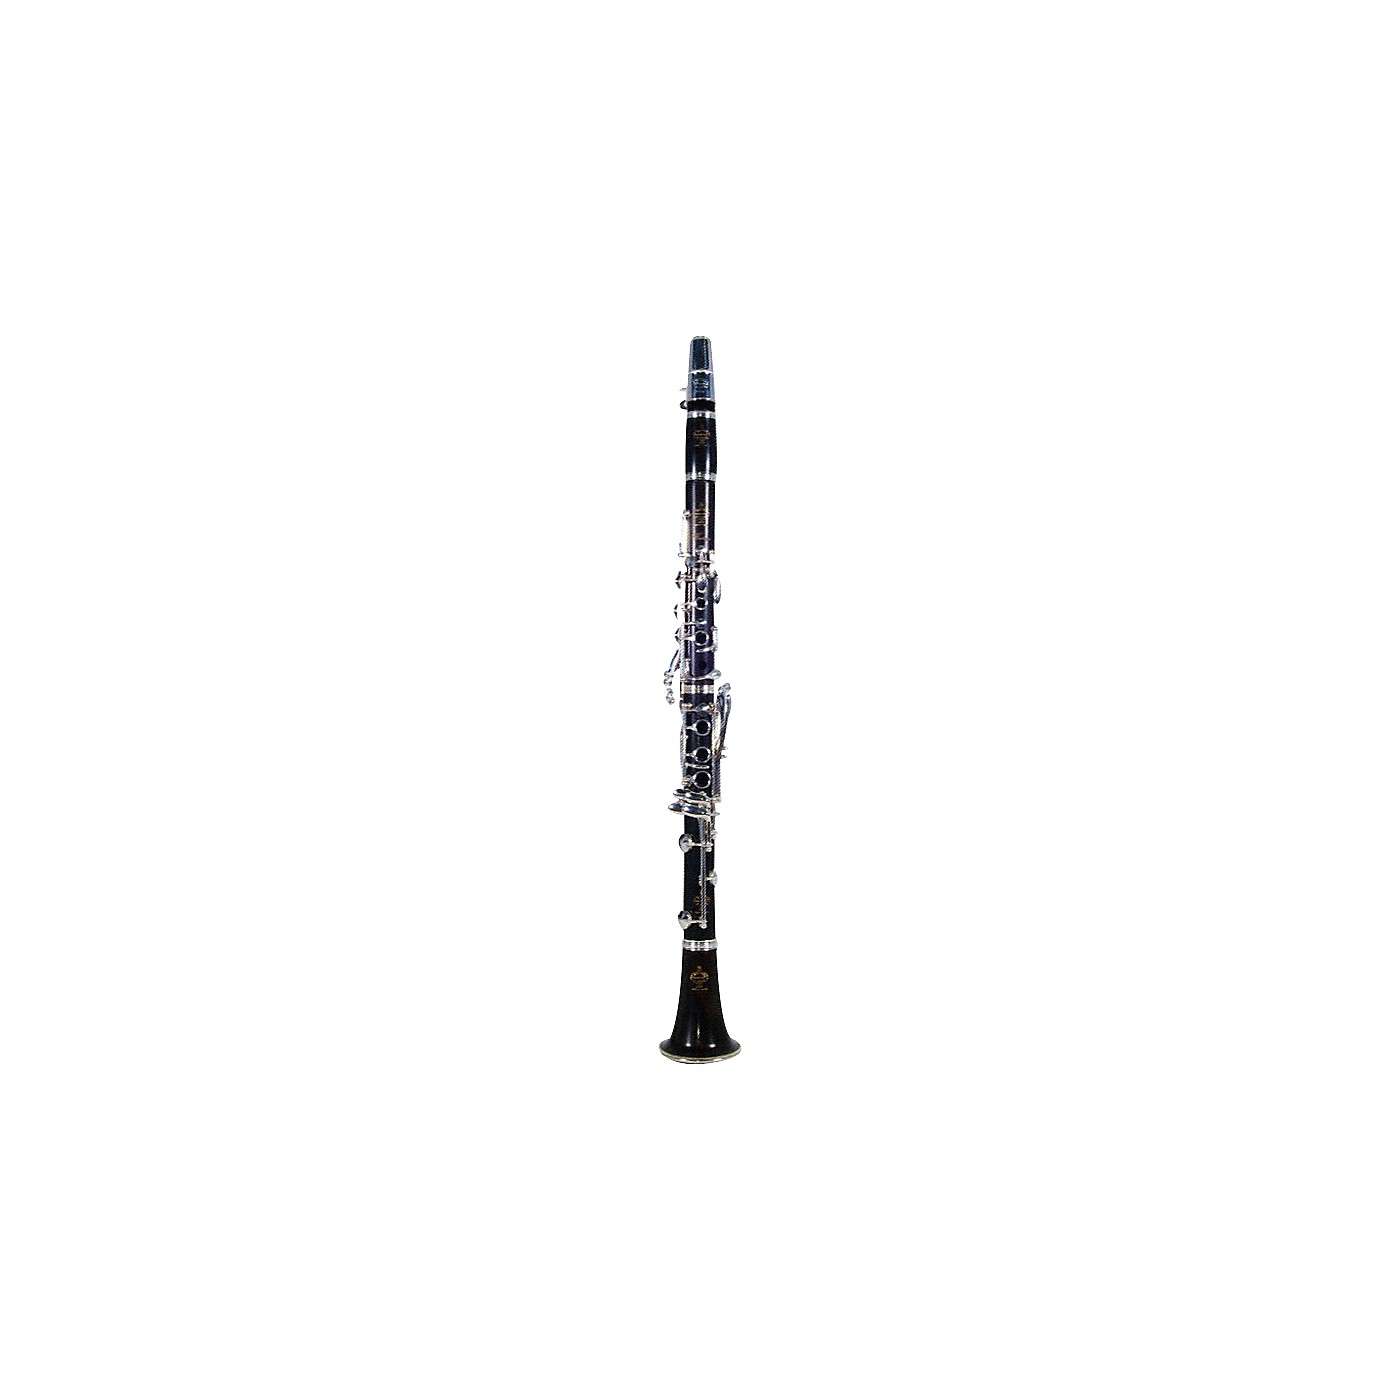 Buffet Crampon Vintage R13 A Clarinet - Woodwind & Brasswind